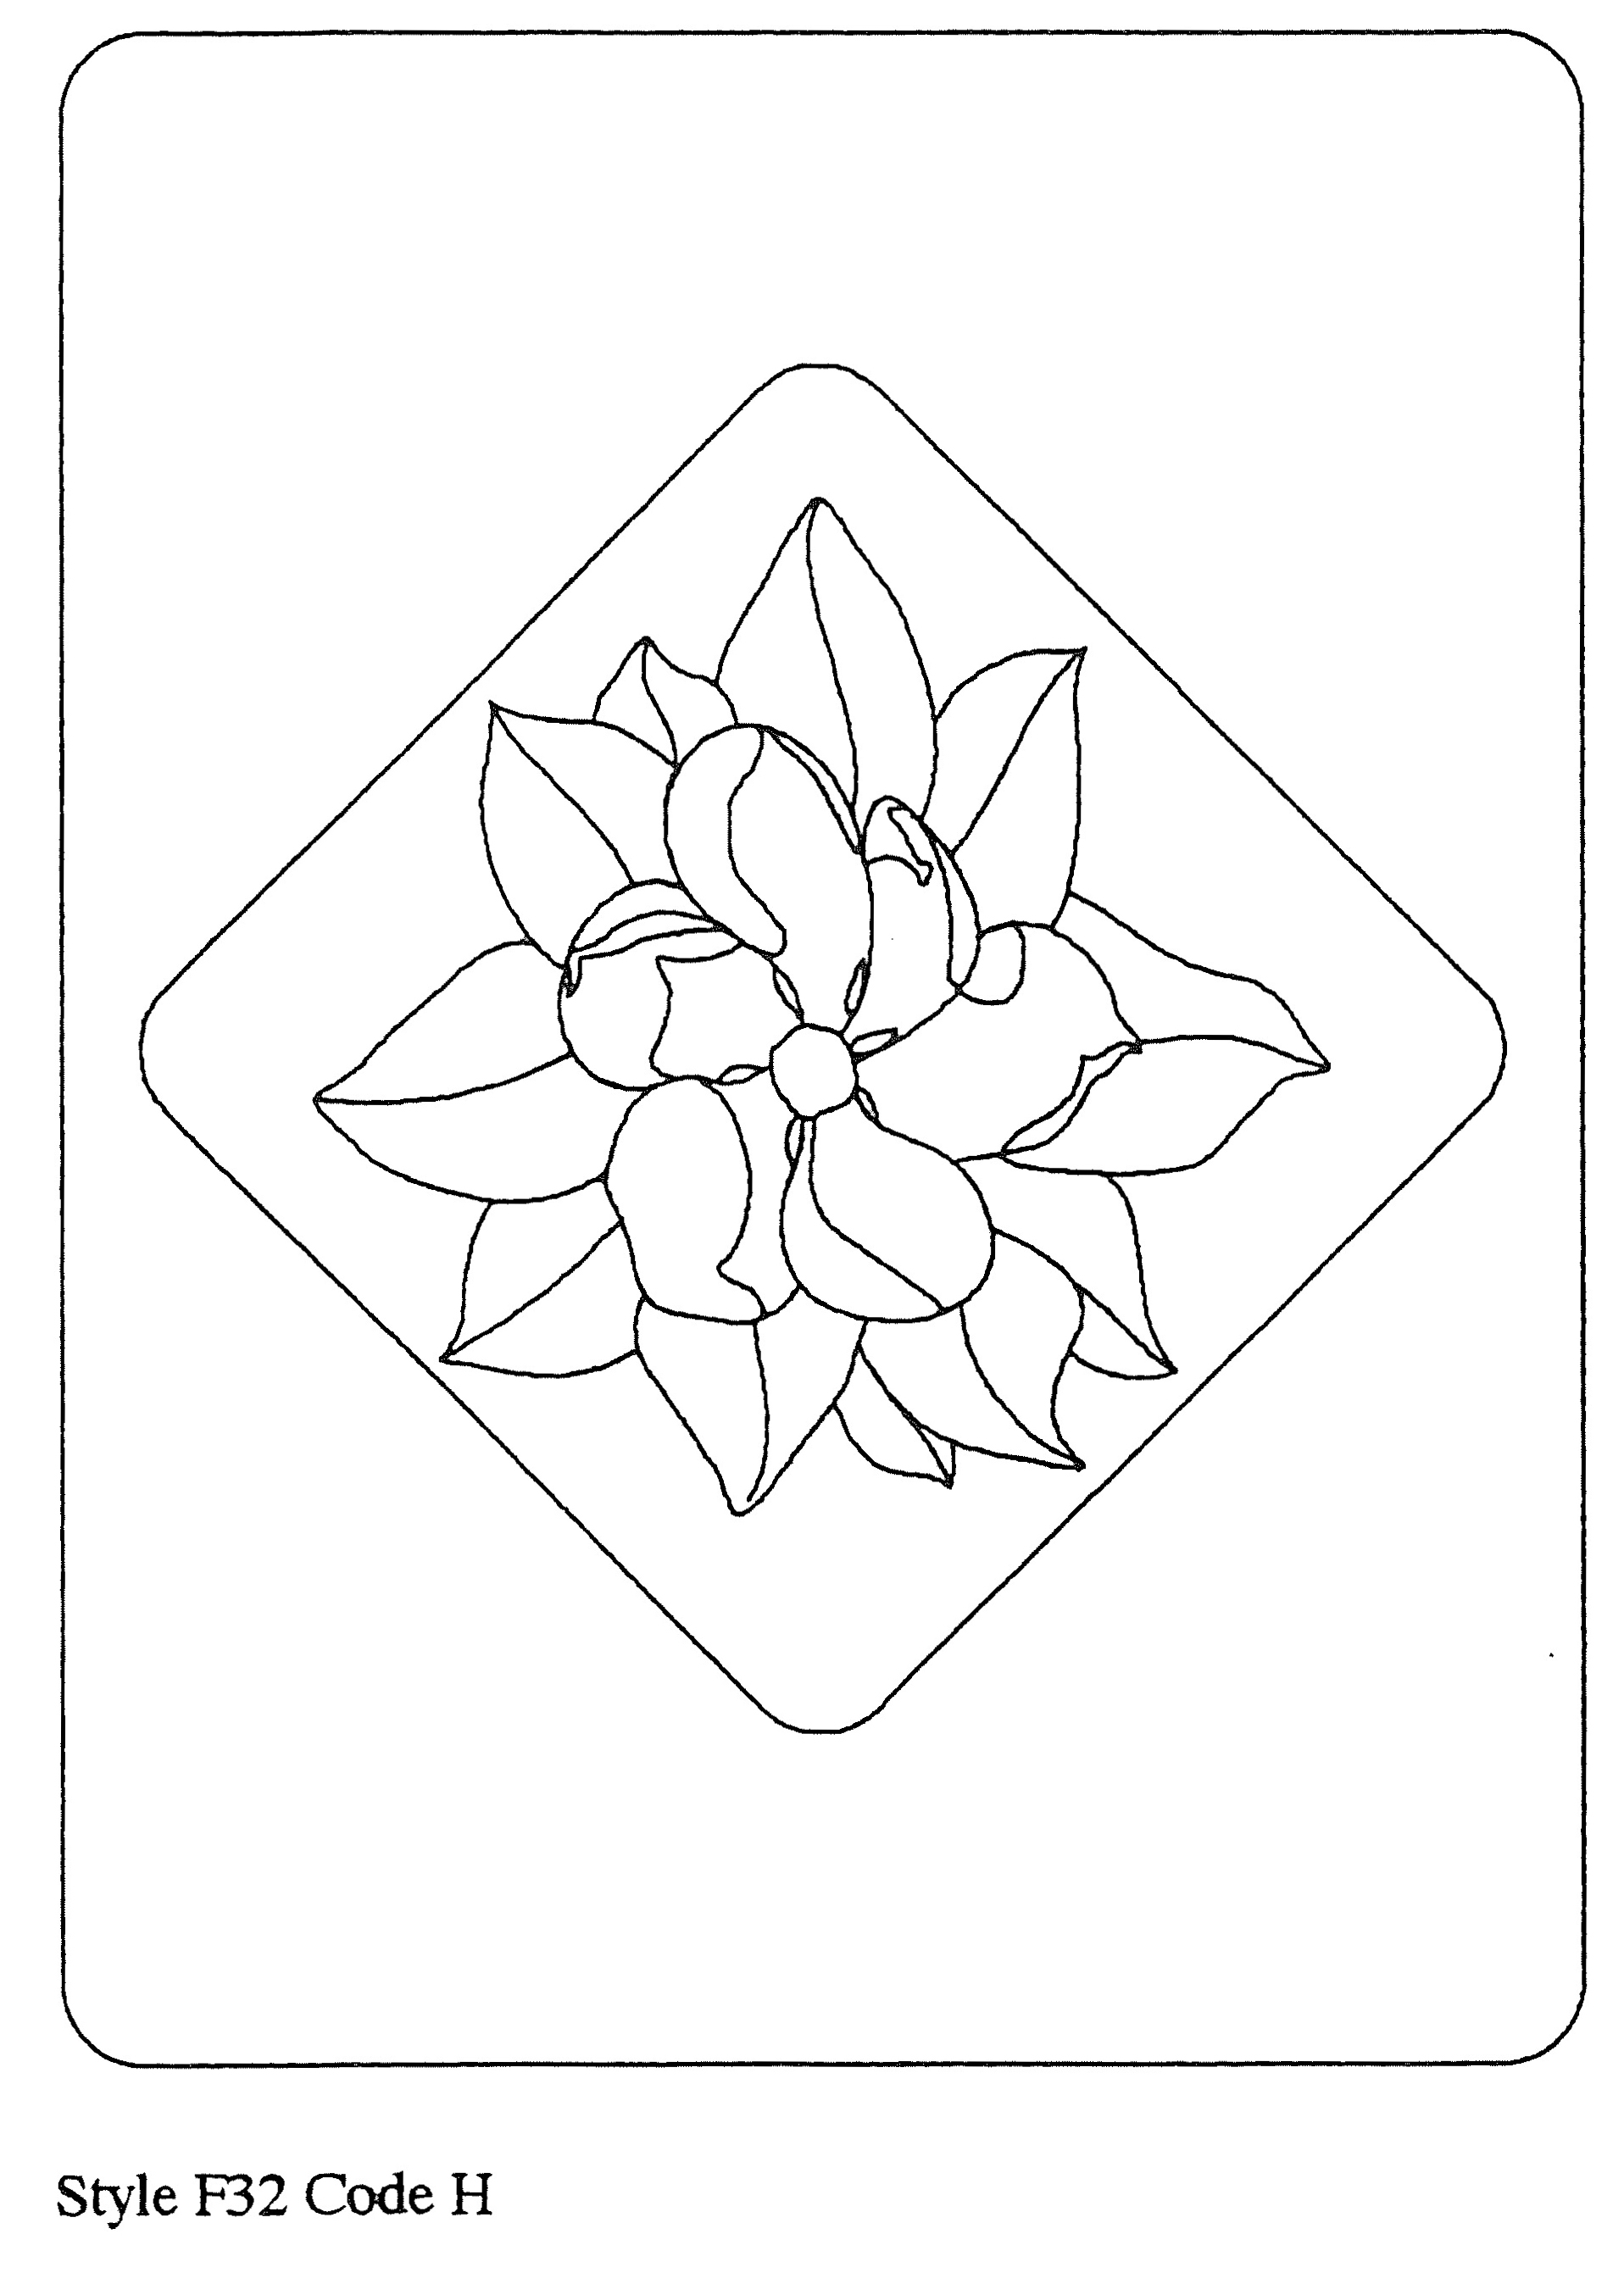 Page 27 copy 2.jpg